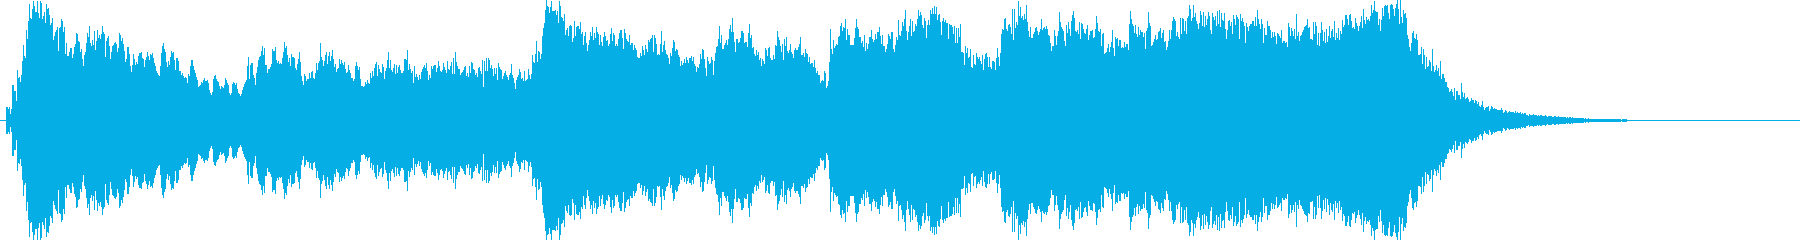 VICTORY FANFAREの再生済みの波形